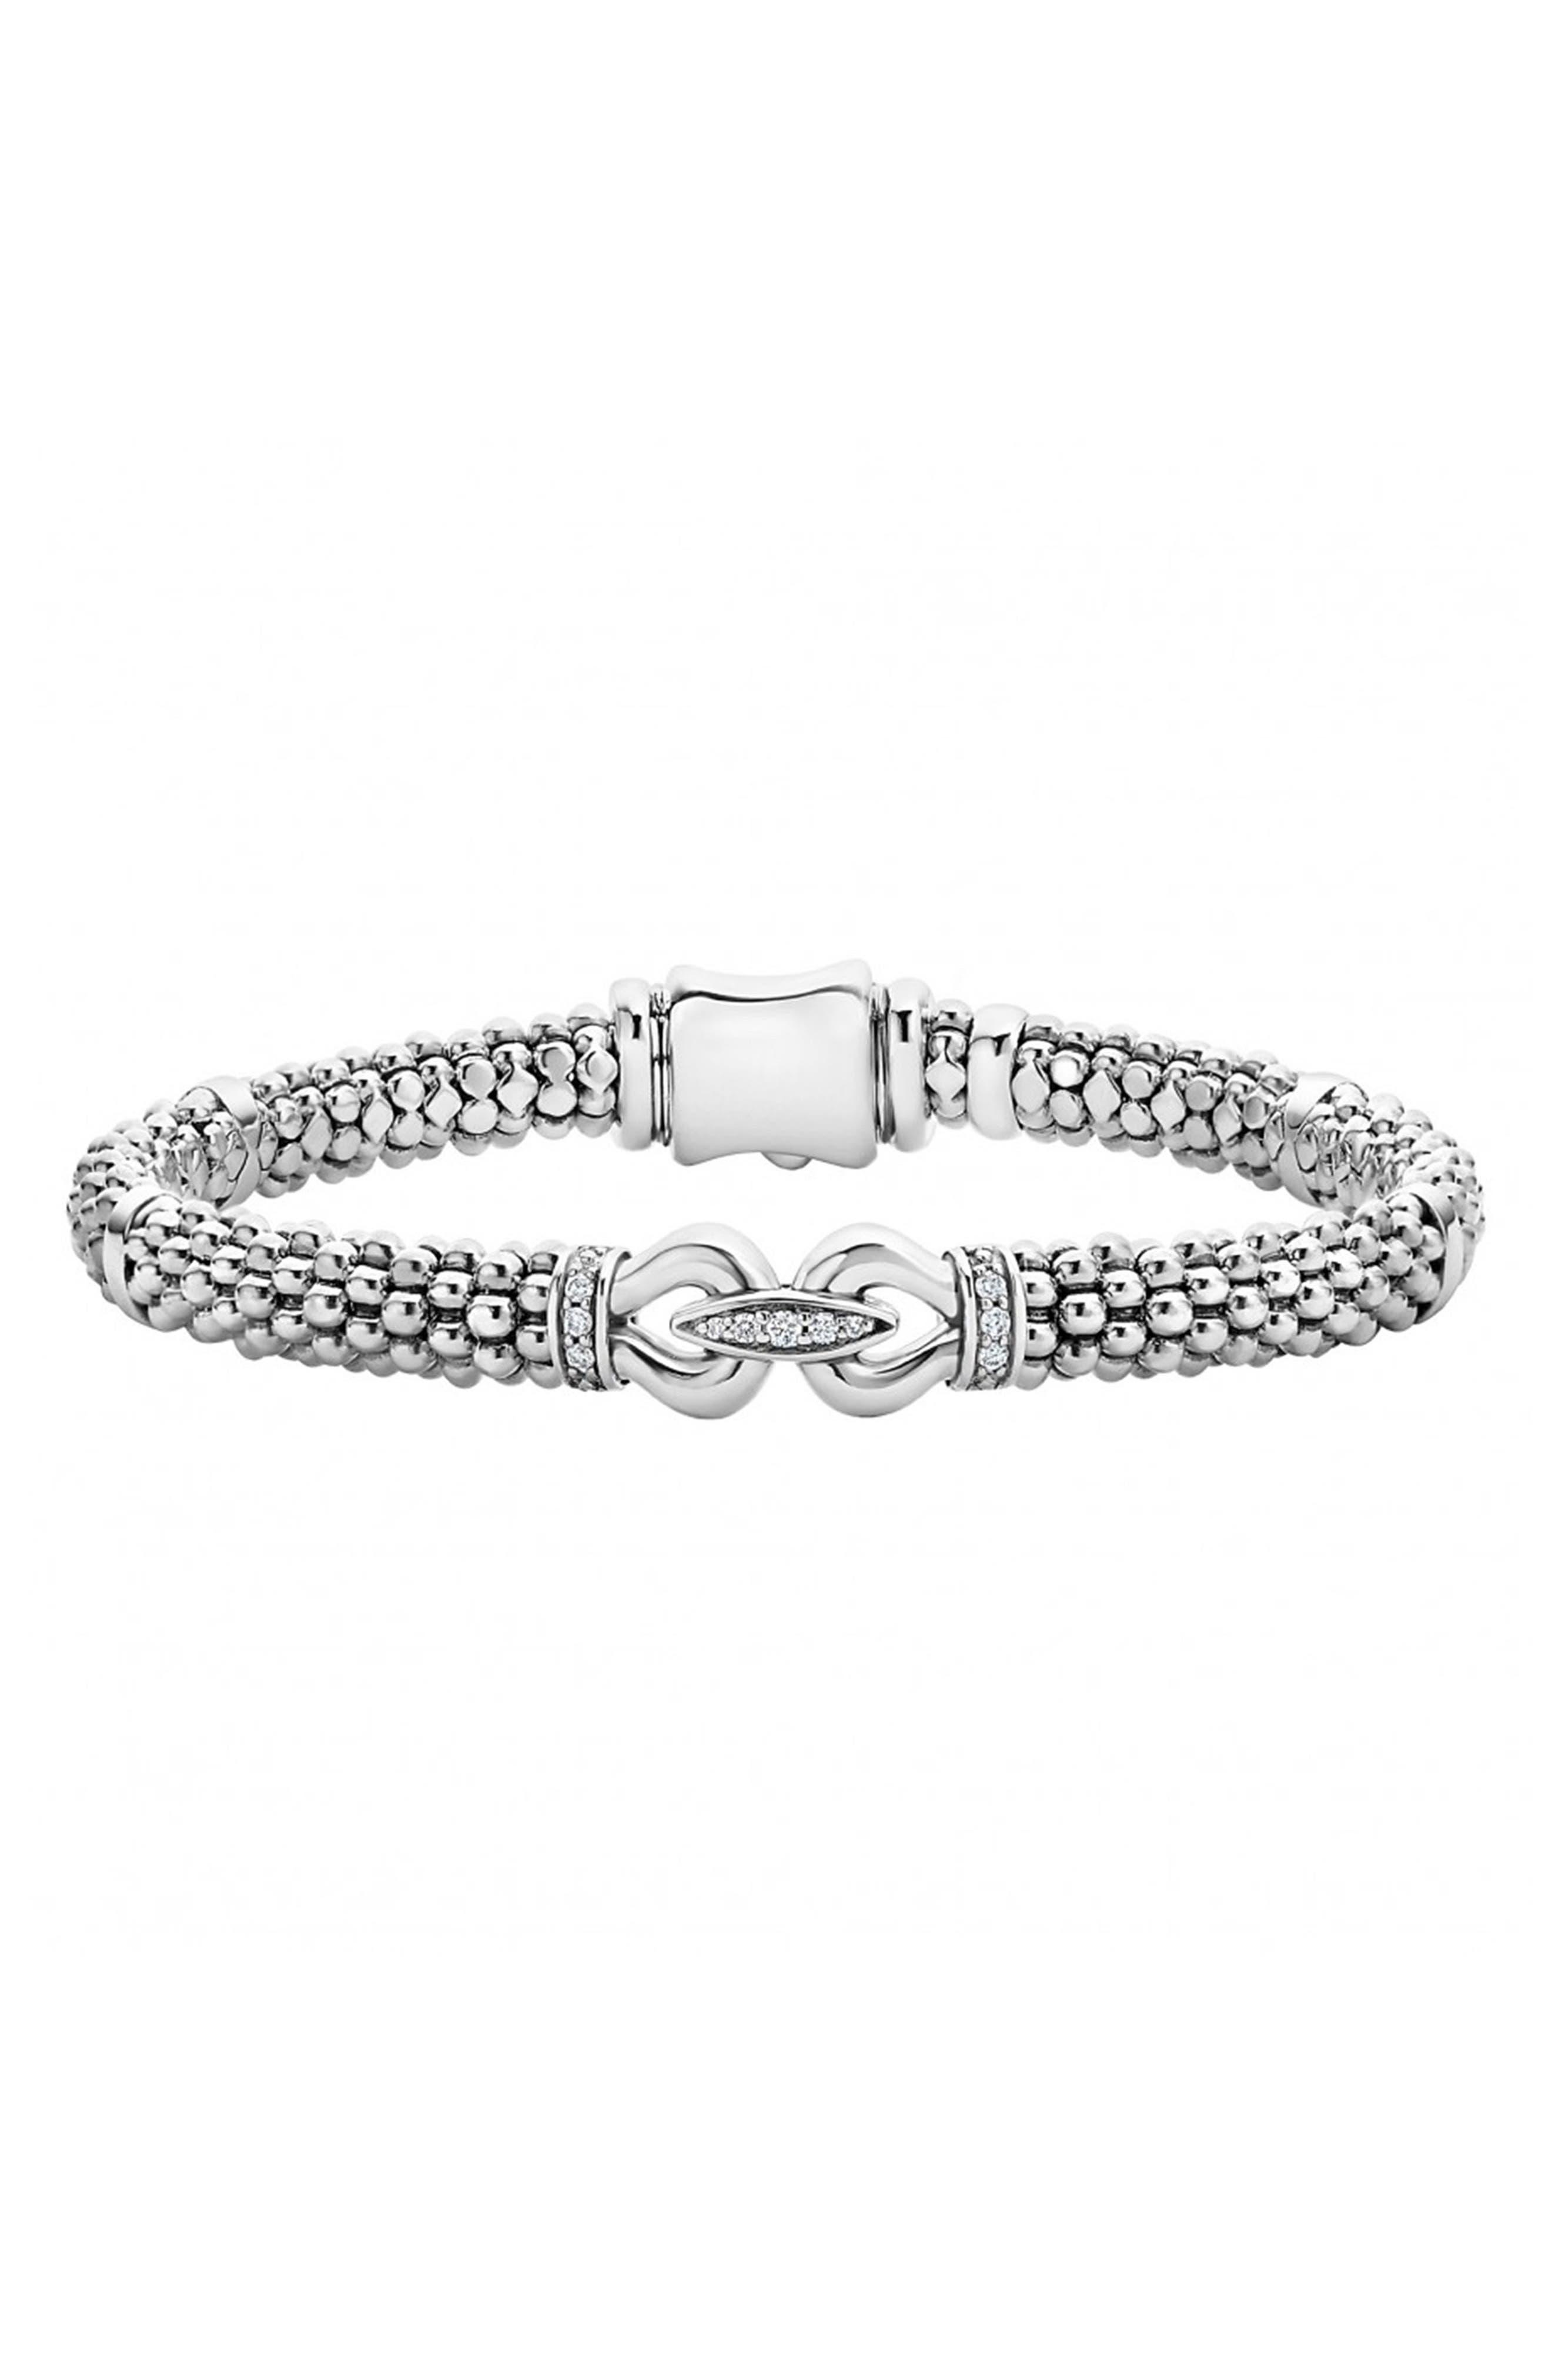 'Derby' Diamond Buckle Rope Bracelet,                             Alternate thumbnail 2, color,                             STERLING SILVER